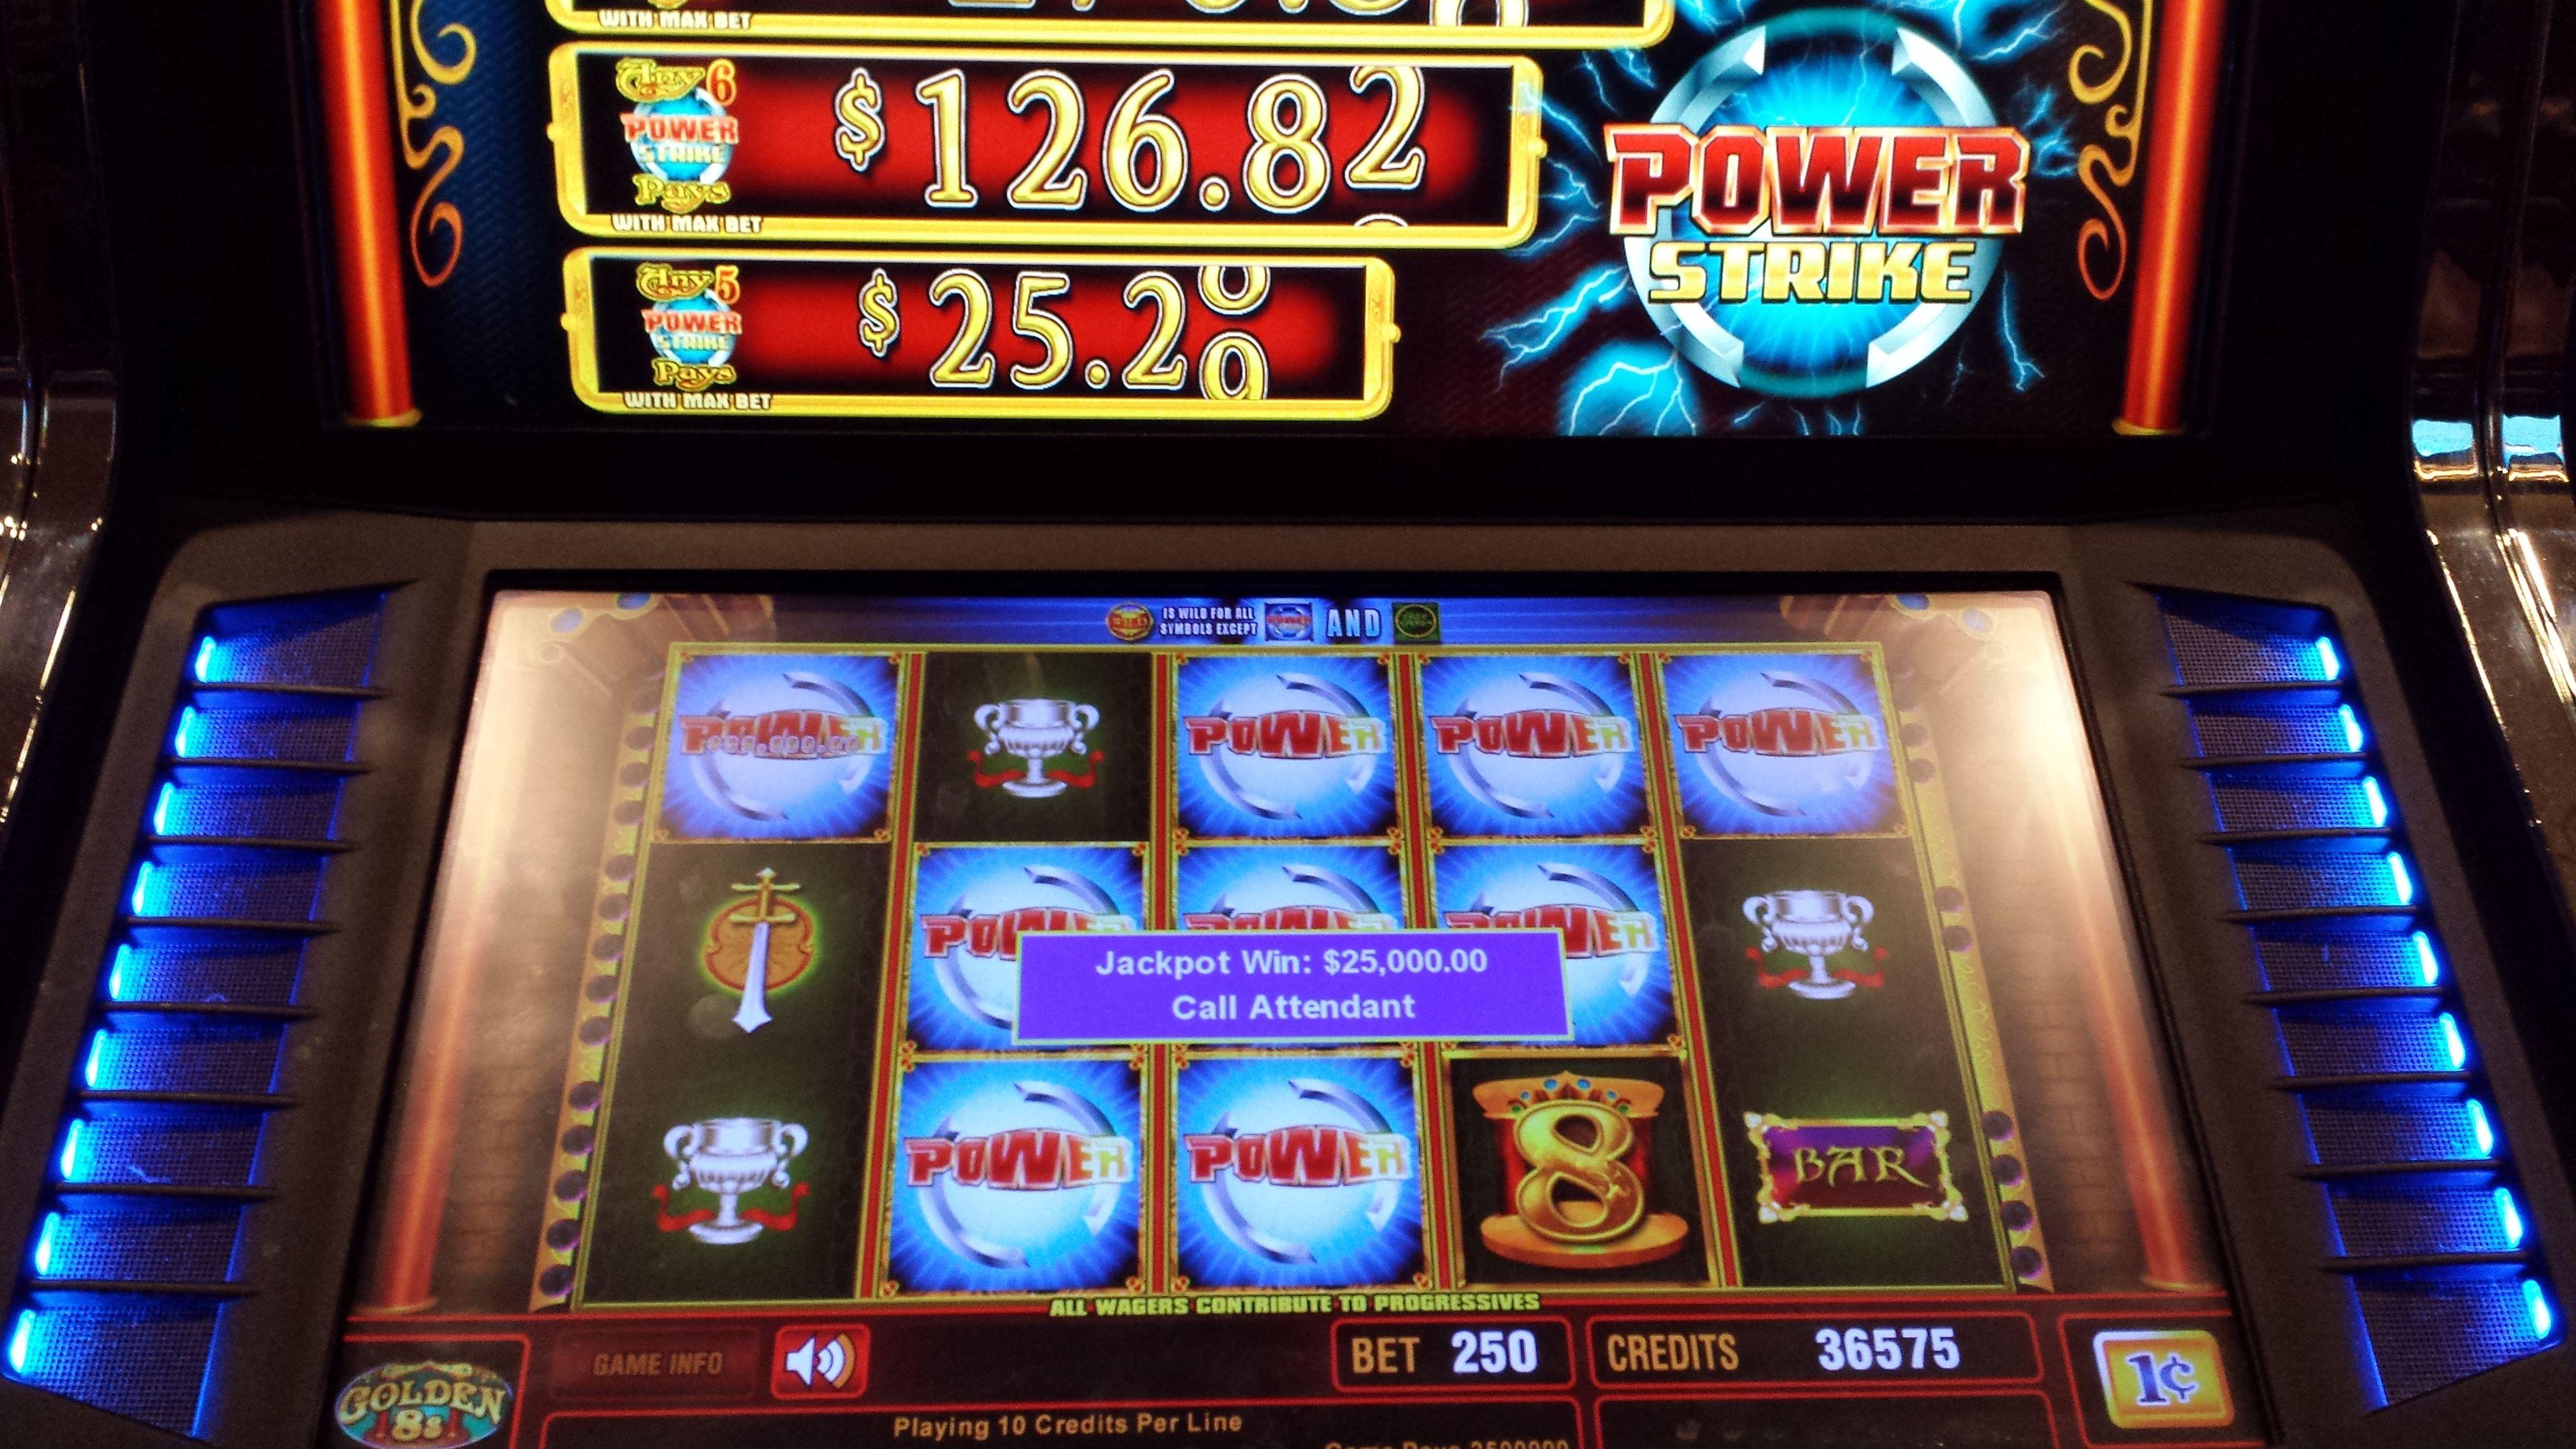 Resorts world casino ny poker laughlins riverside casino